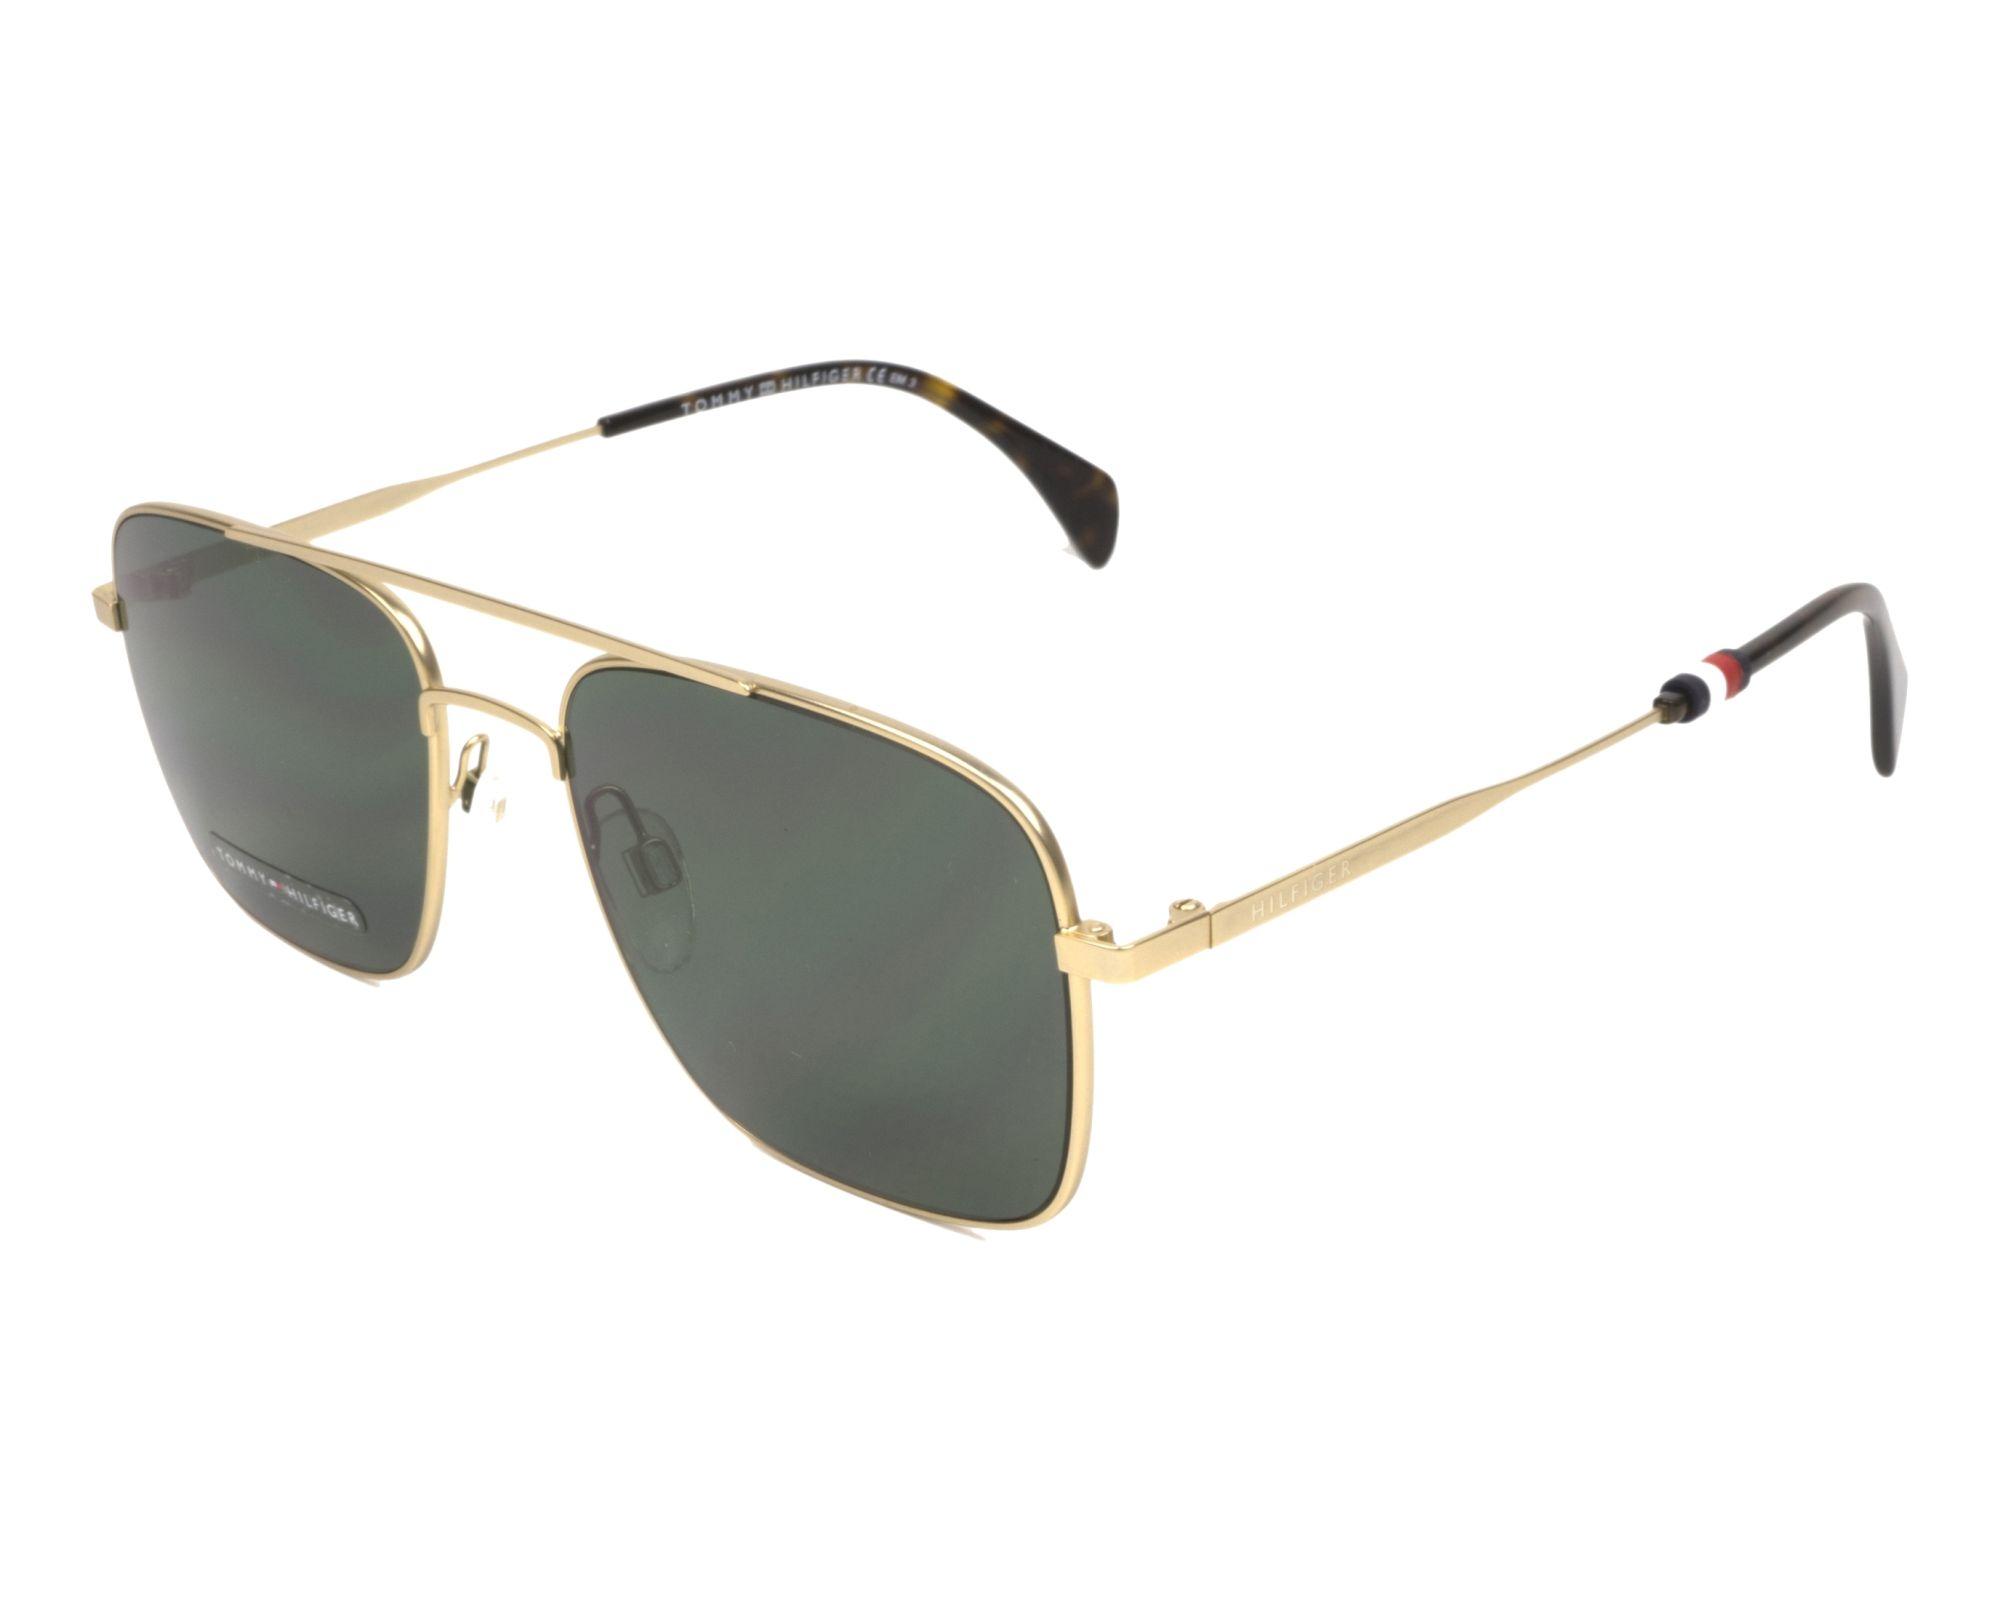 a5b745c9963 Sunglasses Tommy Hilfiger TH-1537-S A0Z QT 55-18 Gold profile